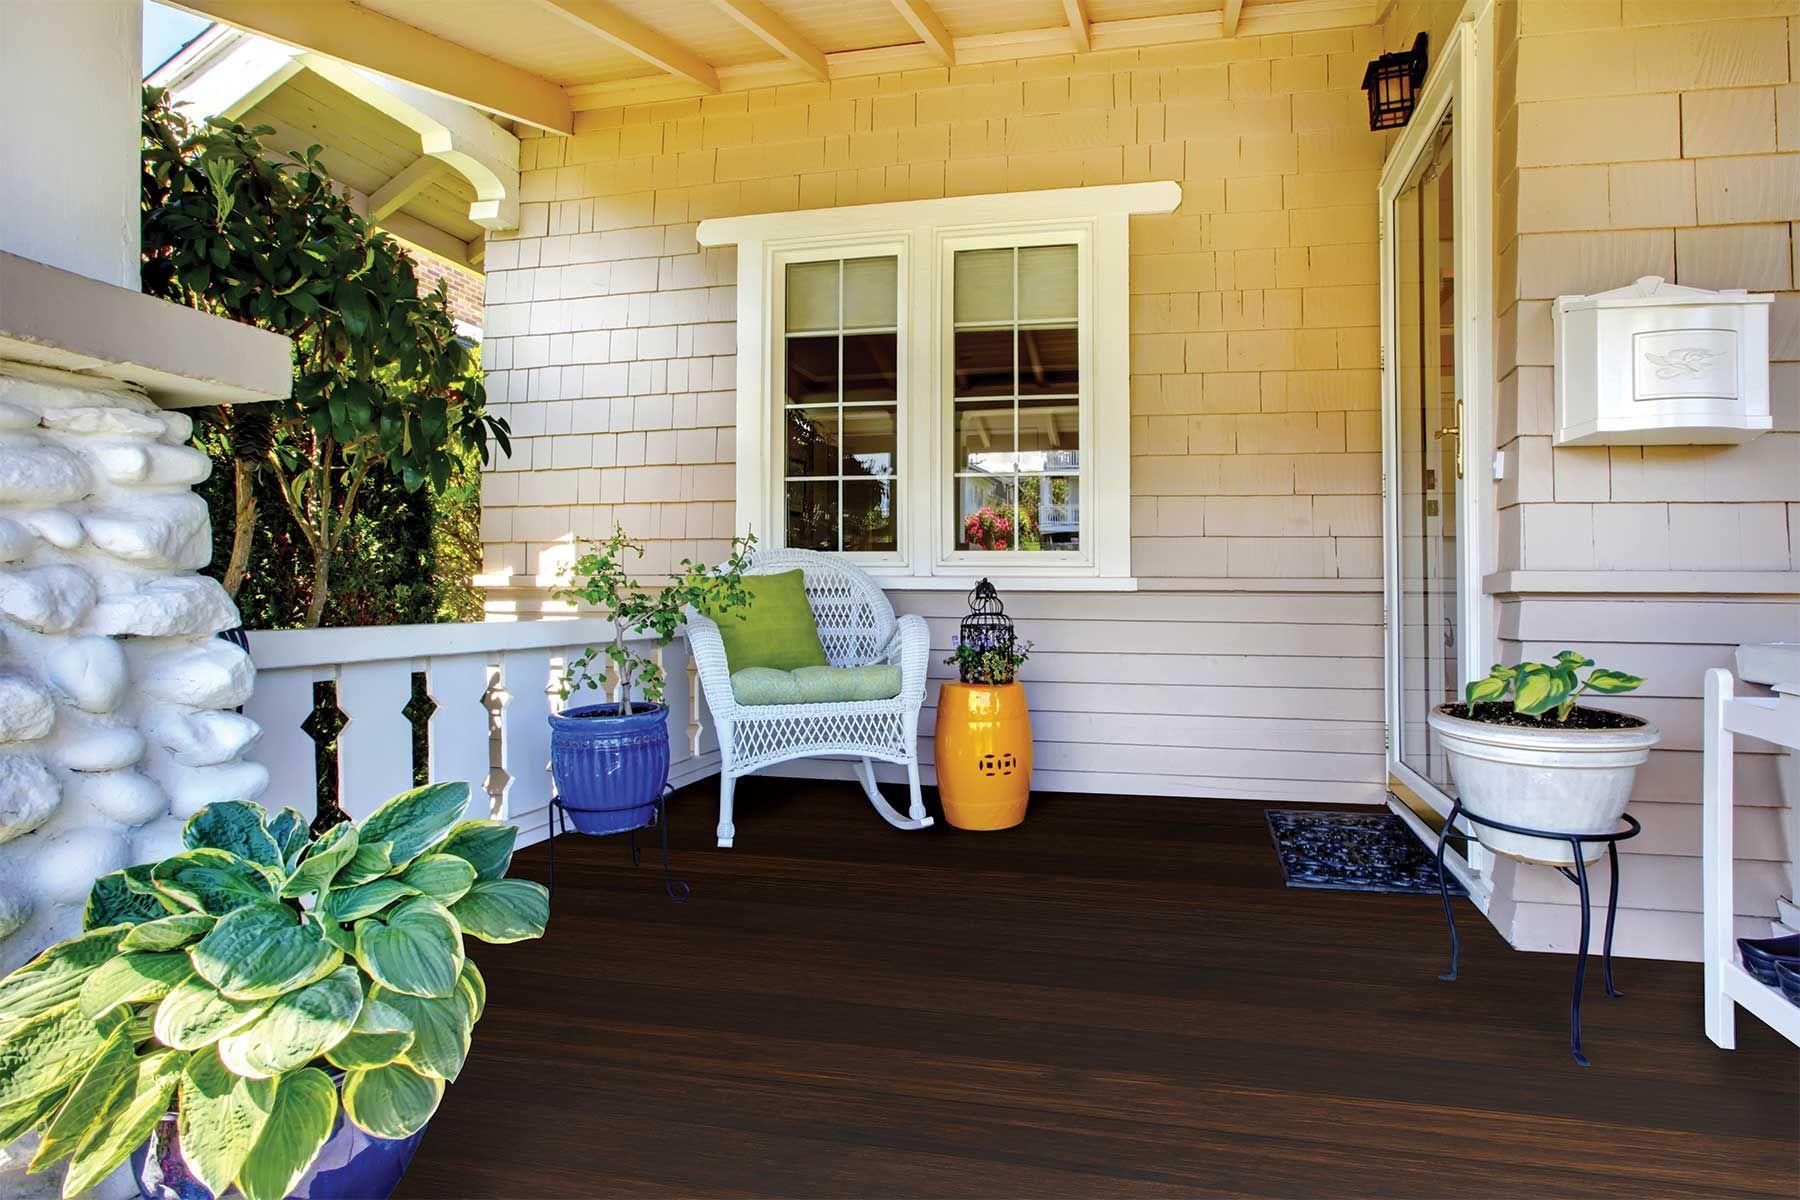 Bamboo Porch Flooring From Dasso Xtr Spring Porch Decor Indoor Outdoor Area Rugs Outdoor Area Rugs